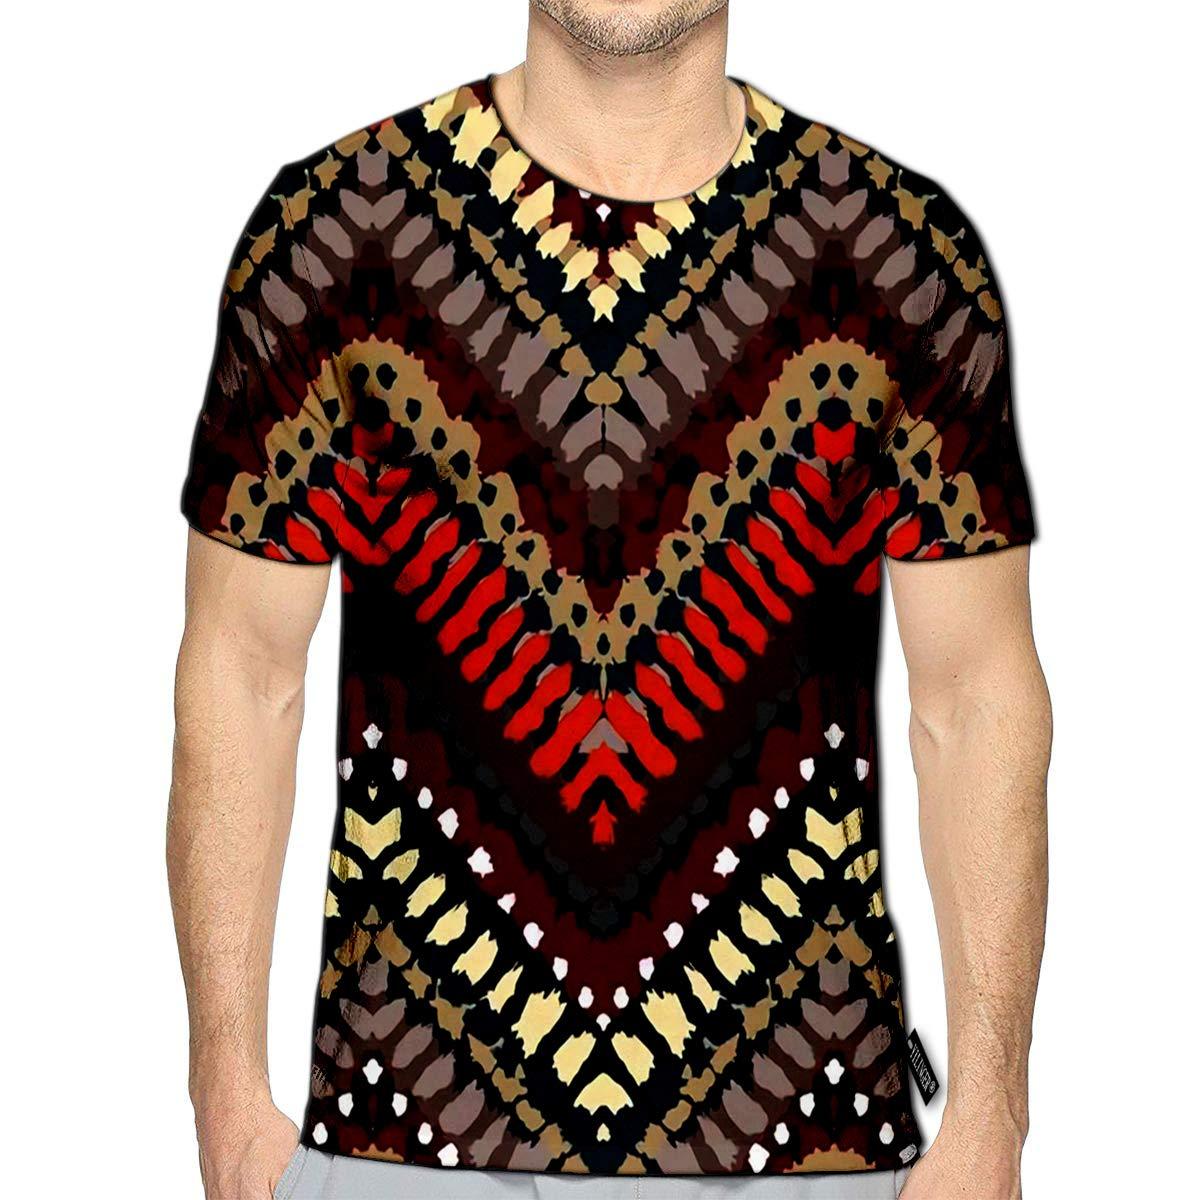 LUJXN Teenagers Crew Neck Tshirt Graphic Short Sleeve Summer Tees Unique